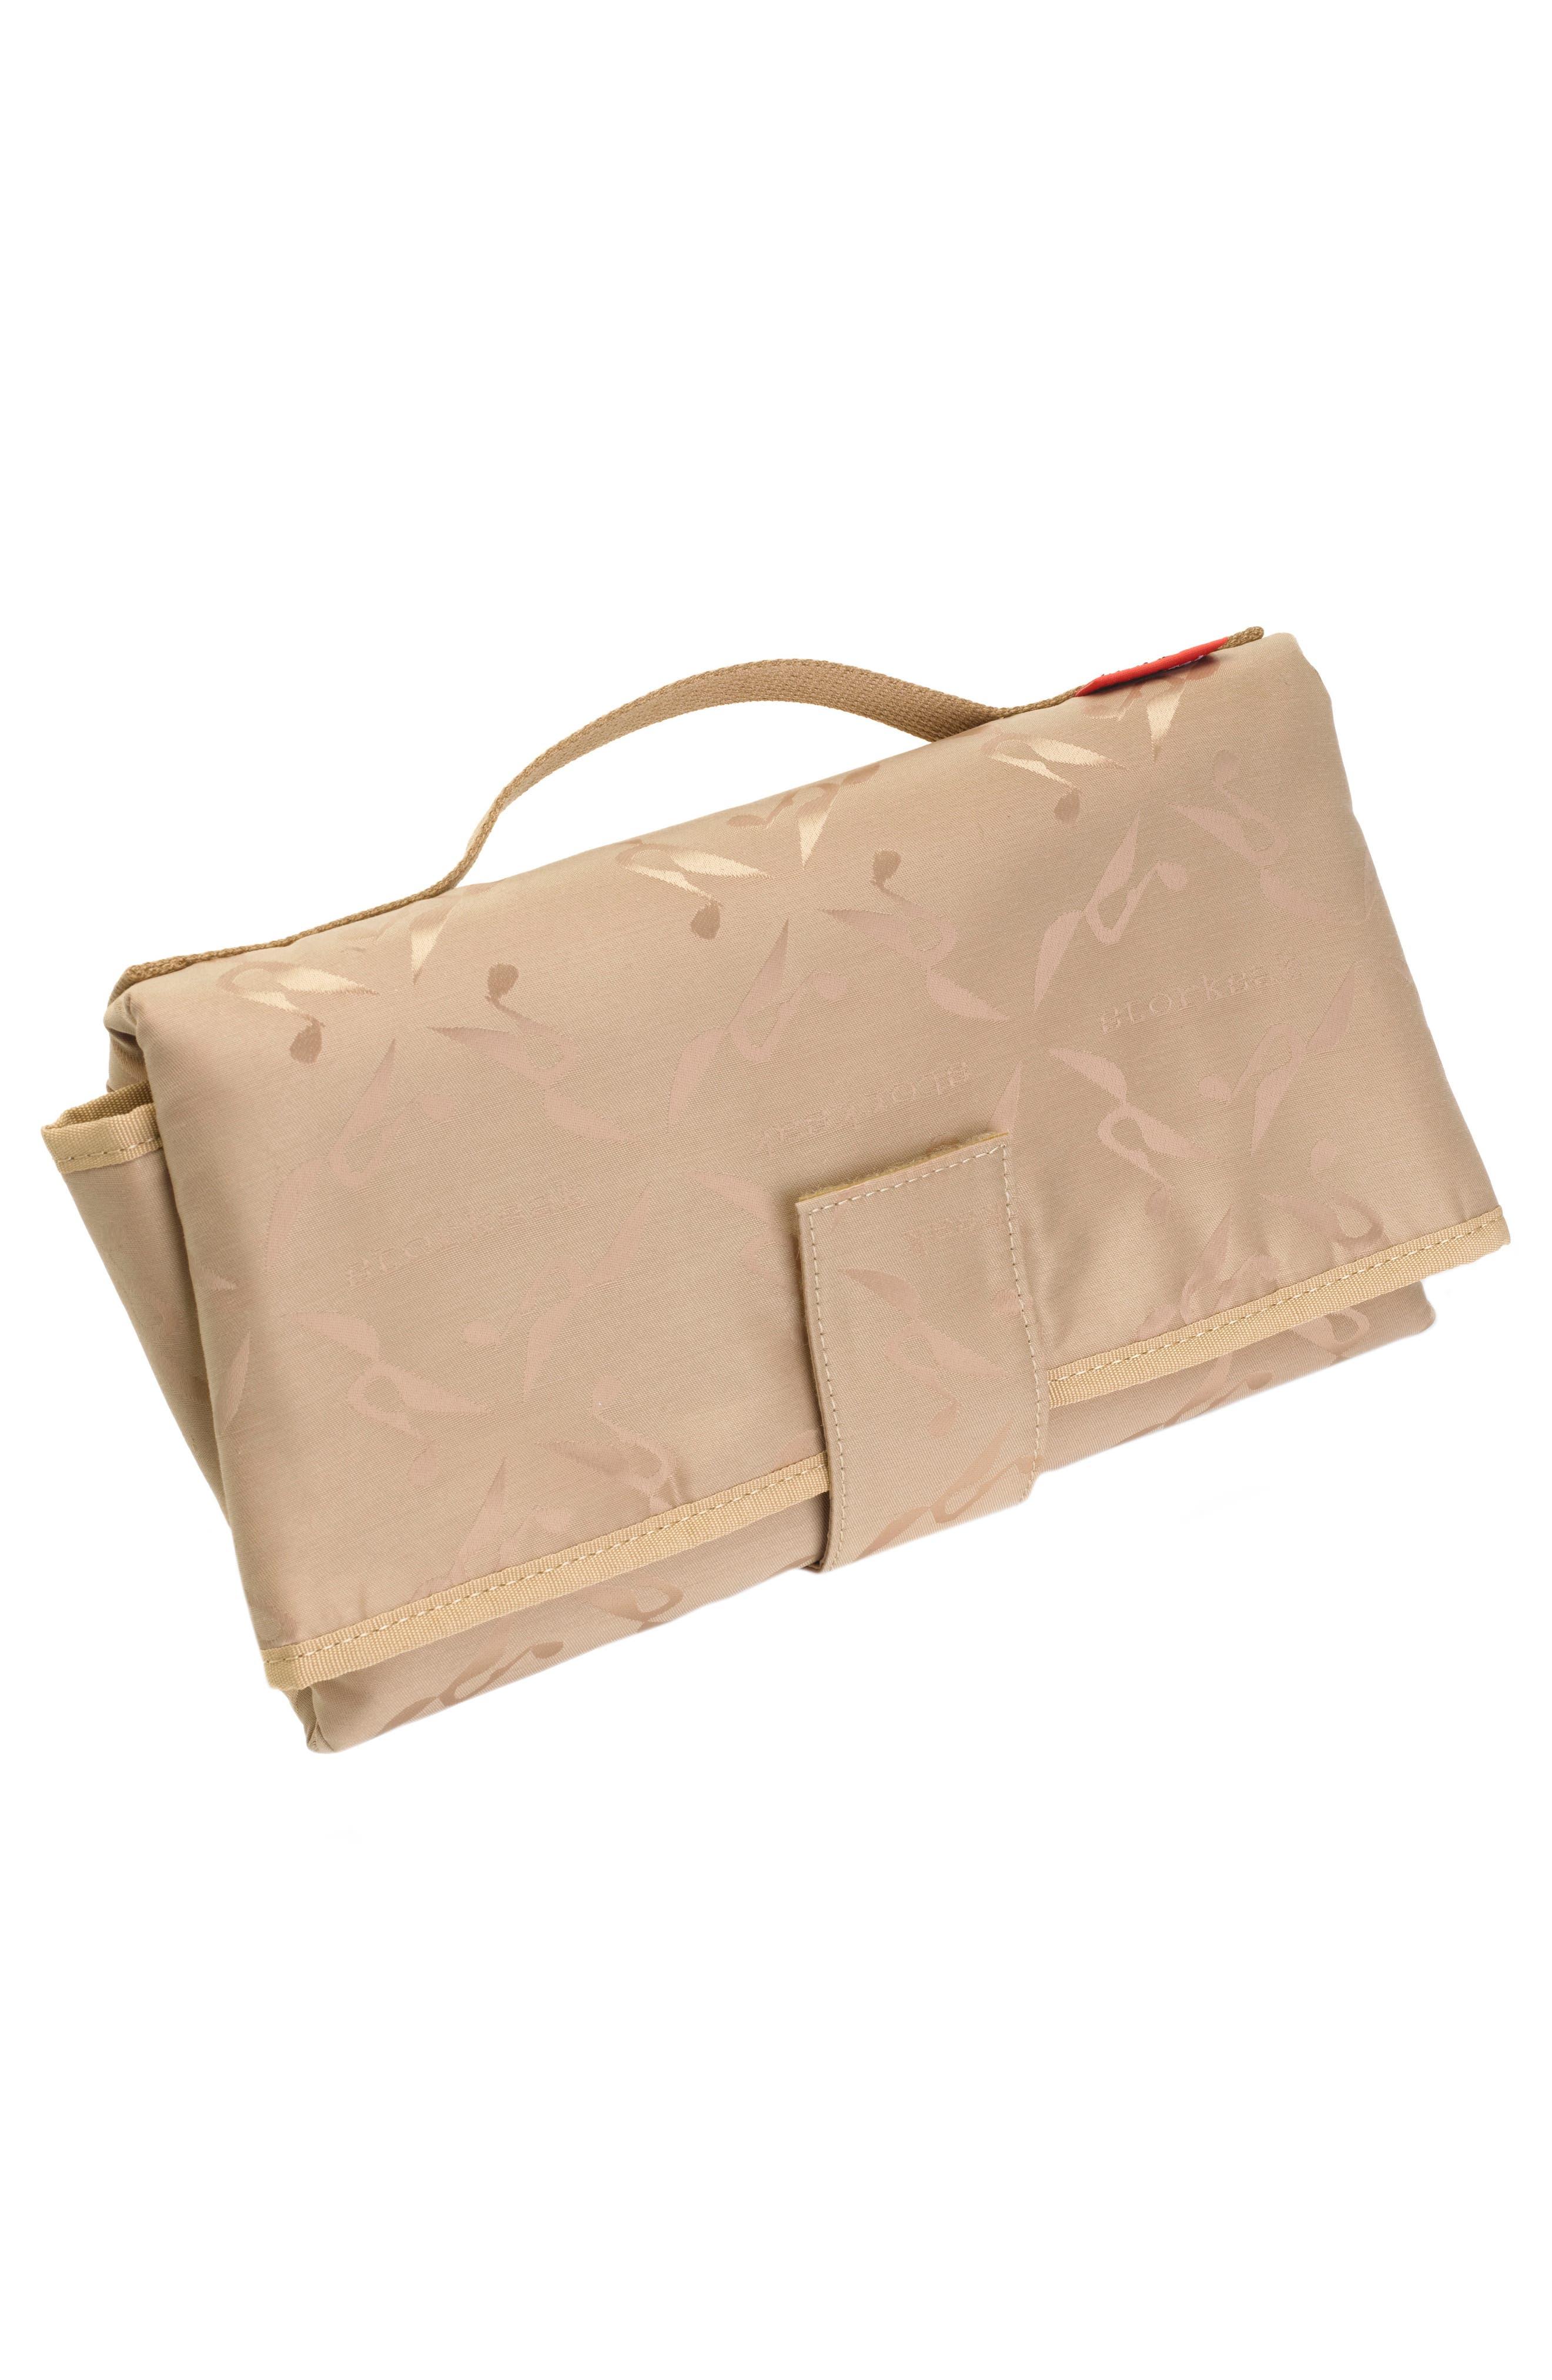 Kym Calfskin Leather Diaper Tote Bag,                             Alternate thumbnail 11, color,                             BLACK